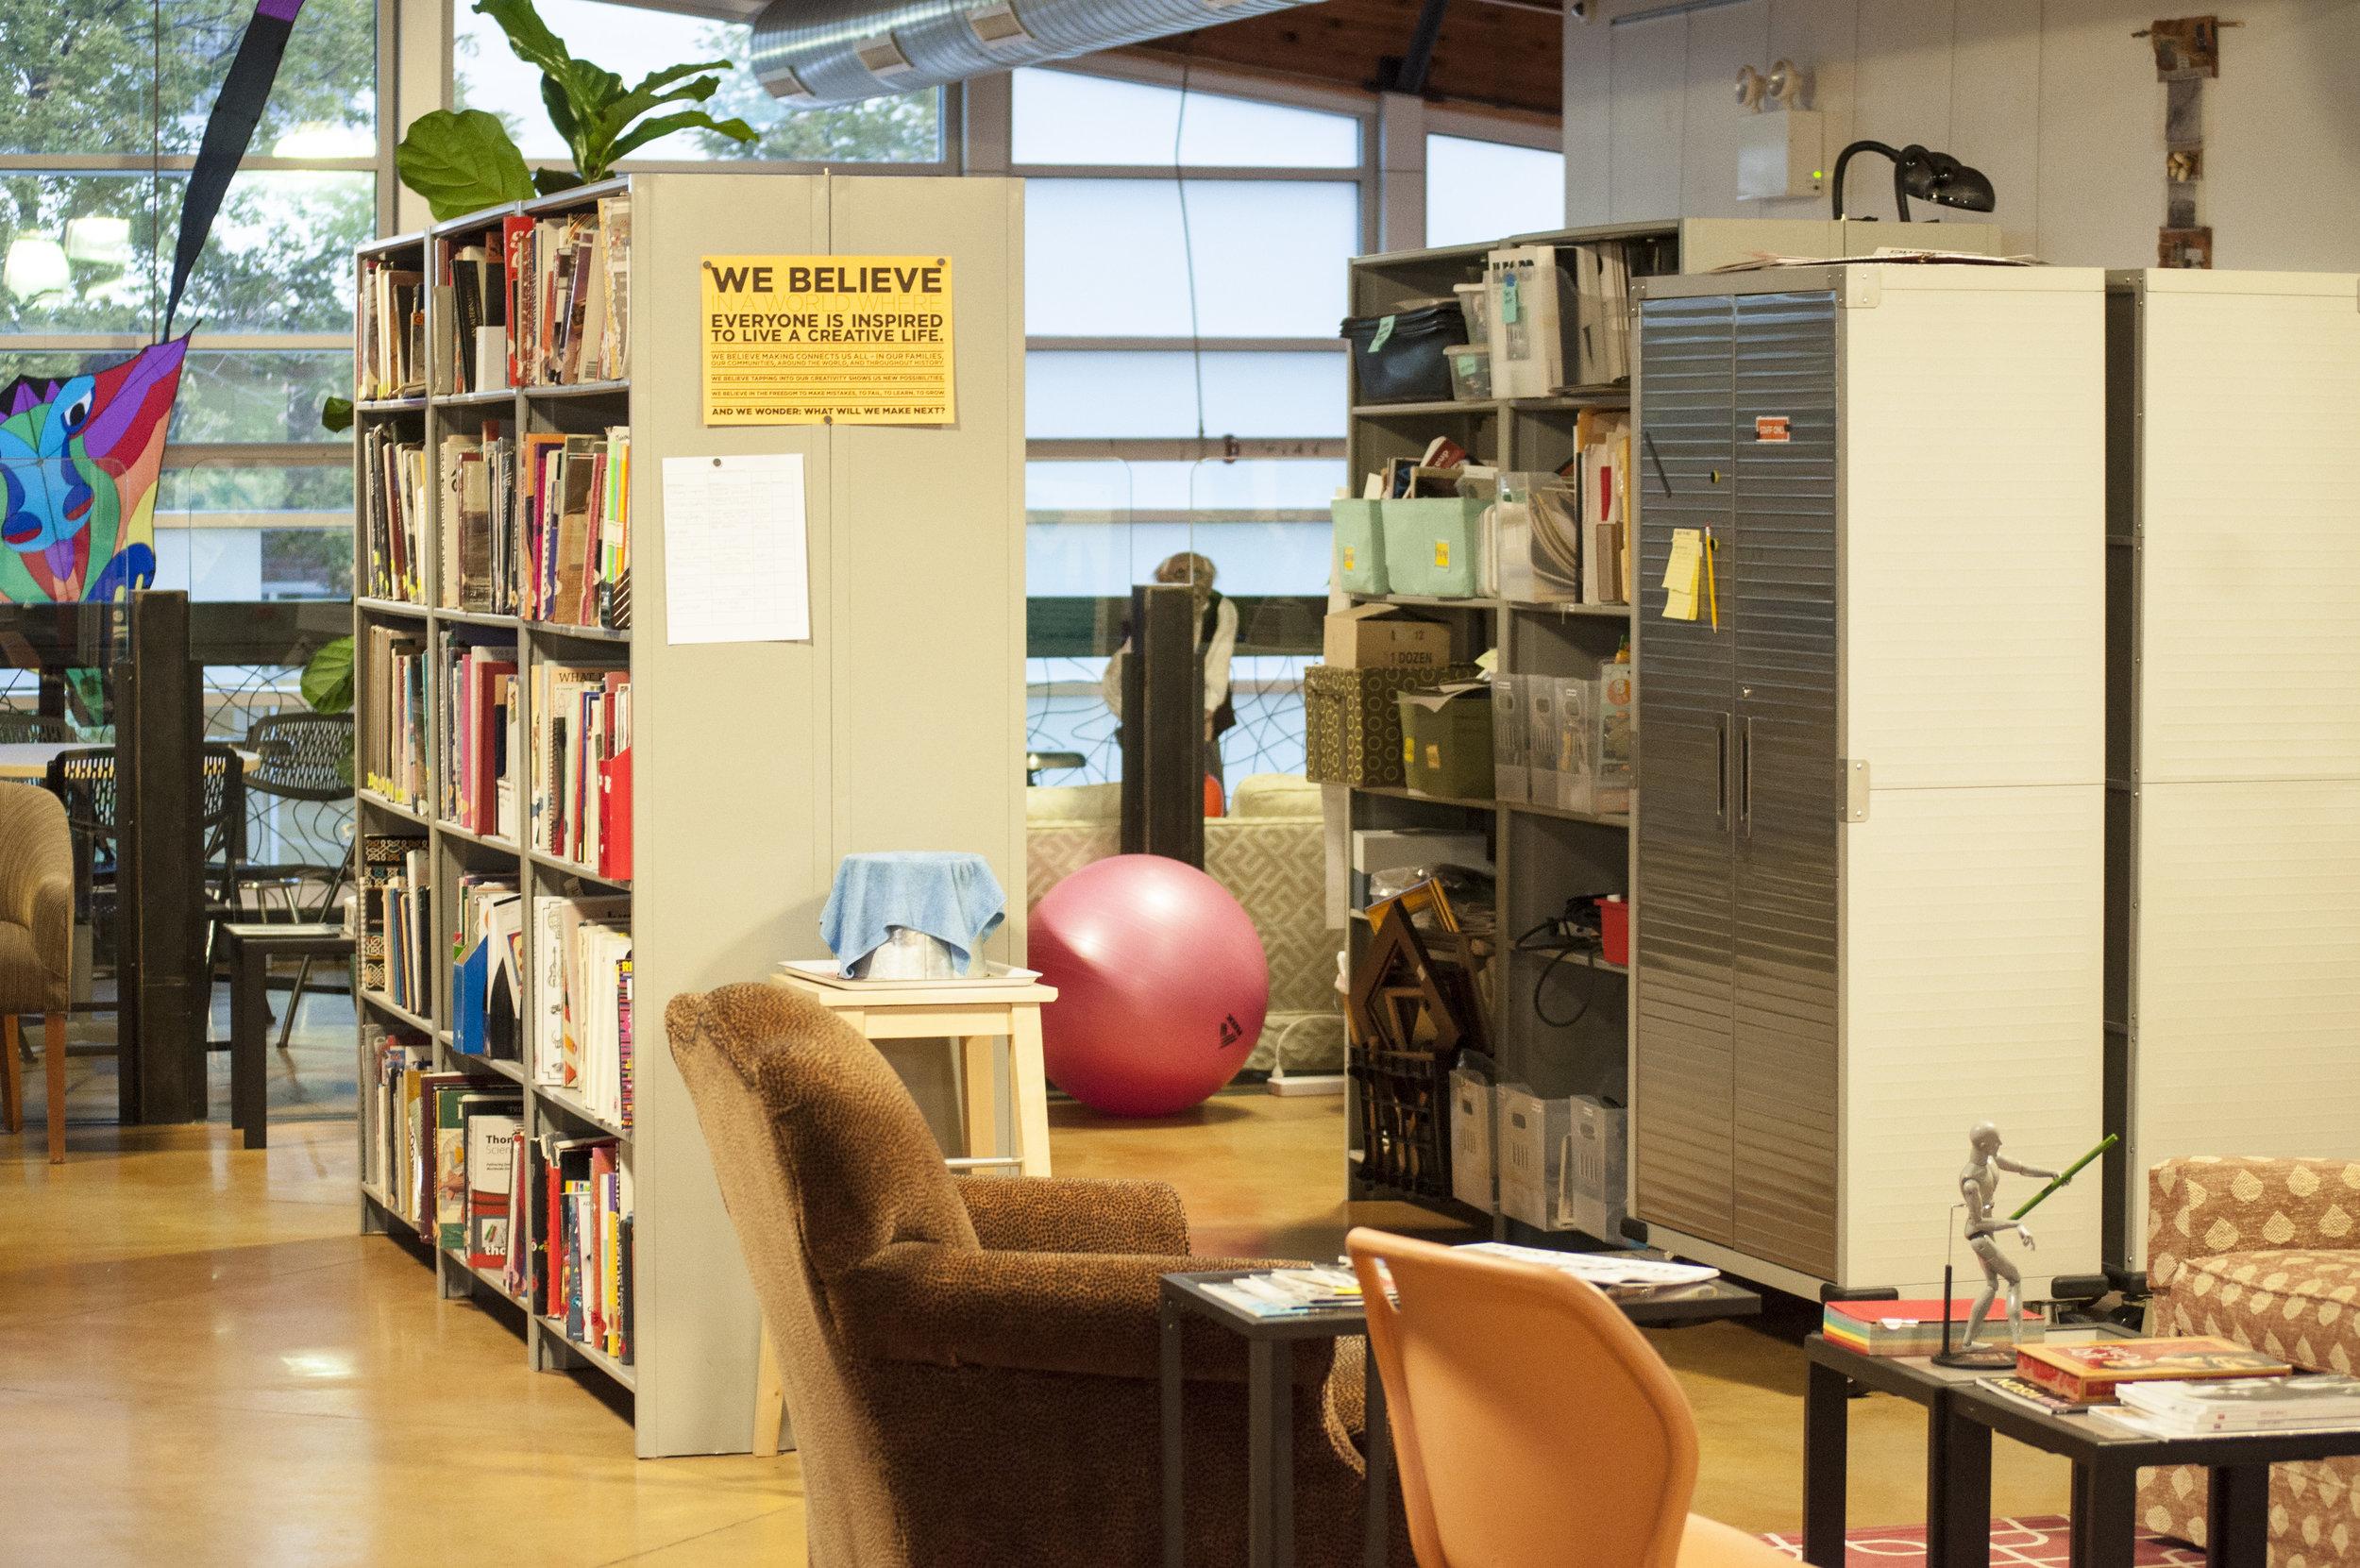 Art Gym Community Library